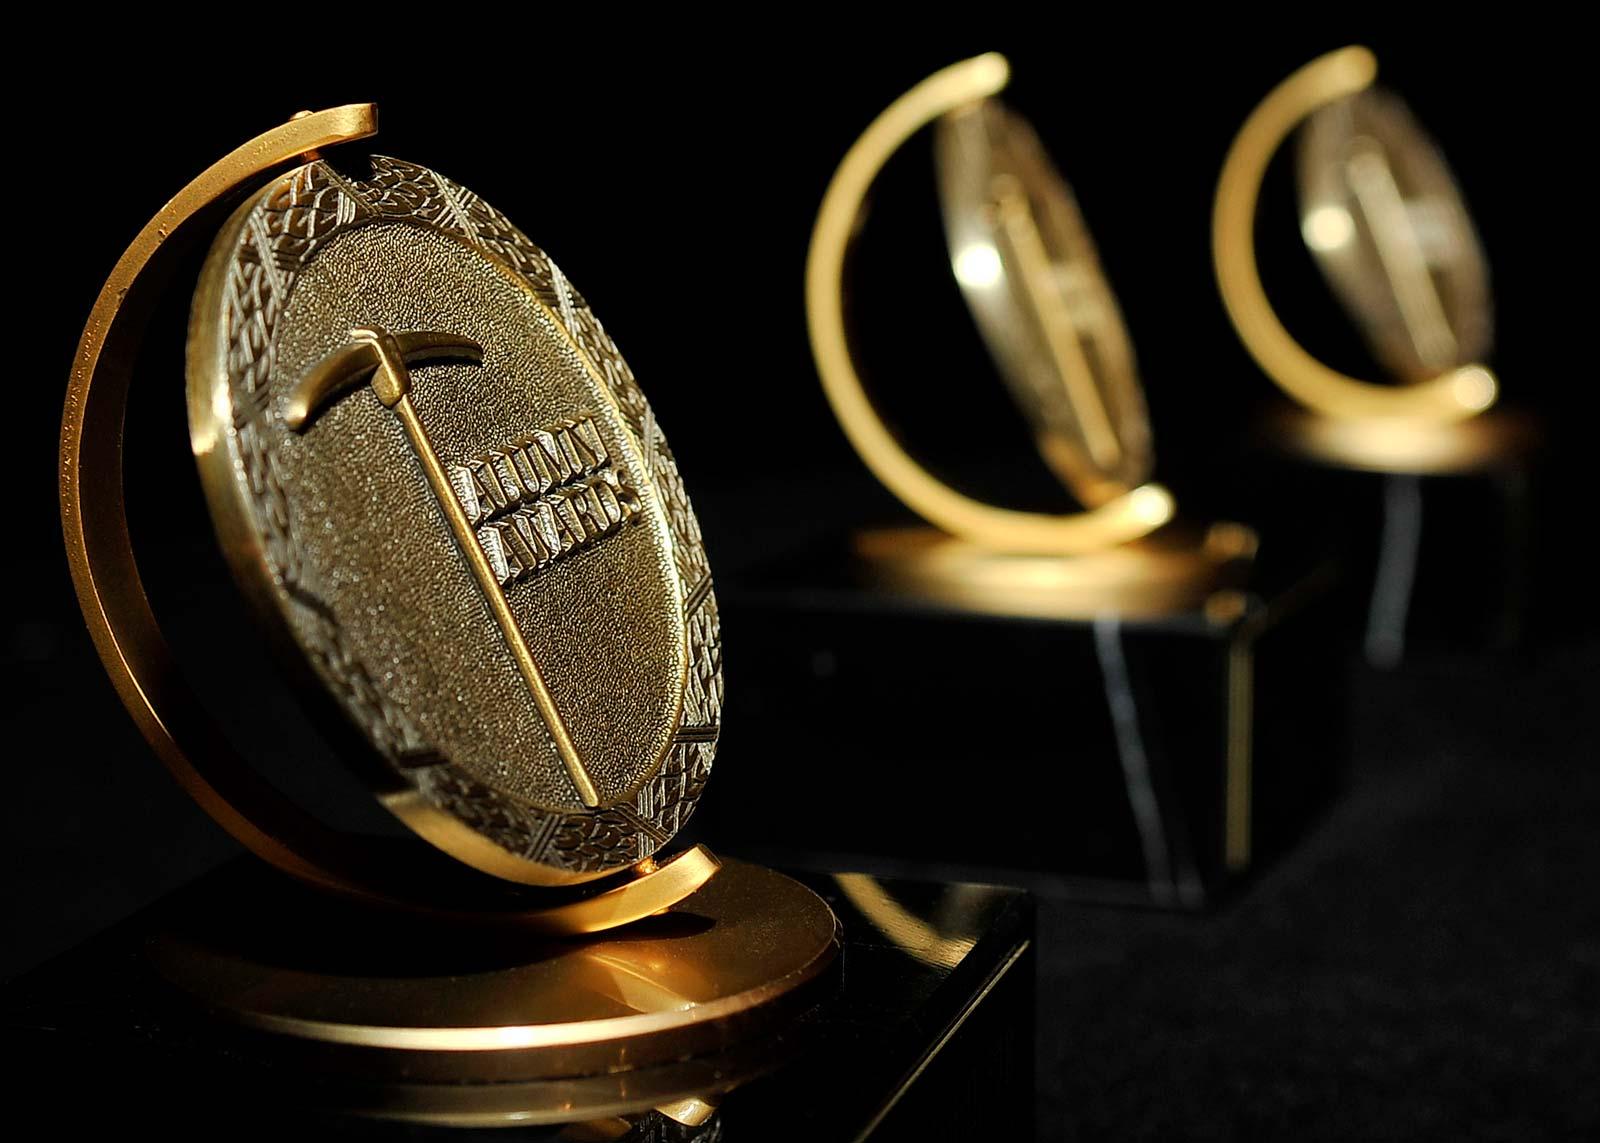 Alumni awards medallion